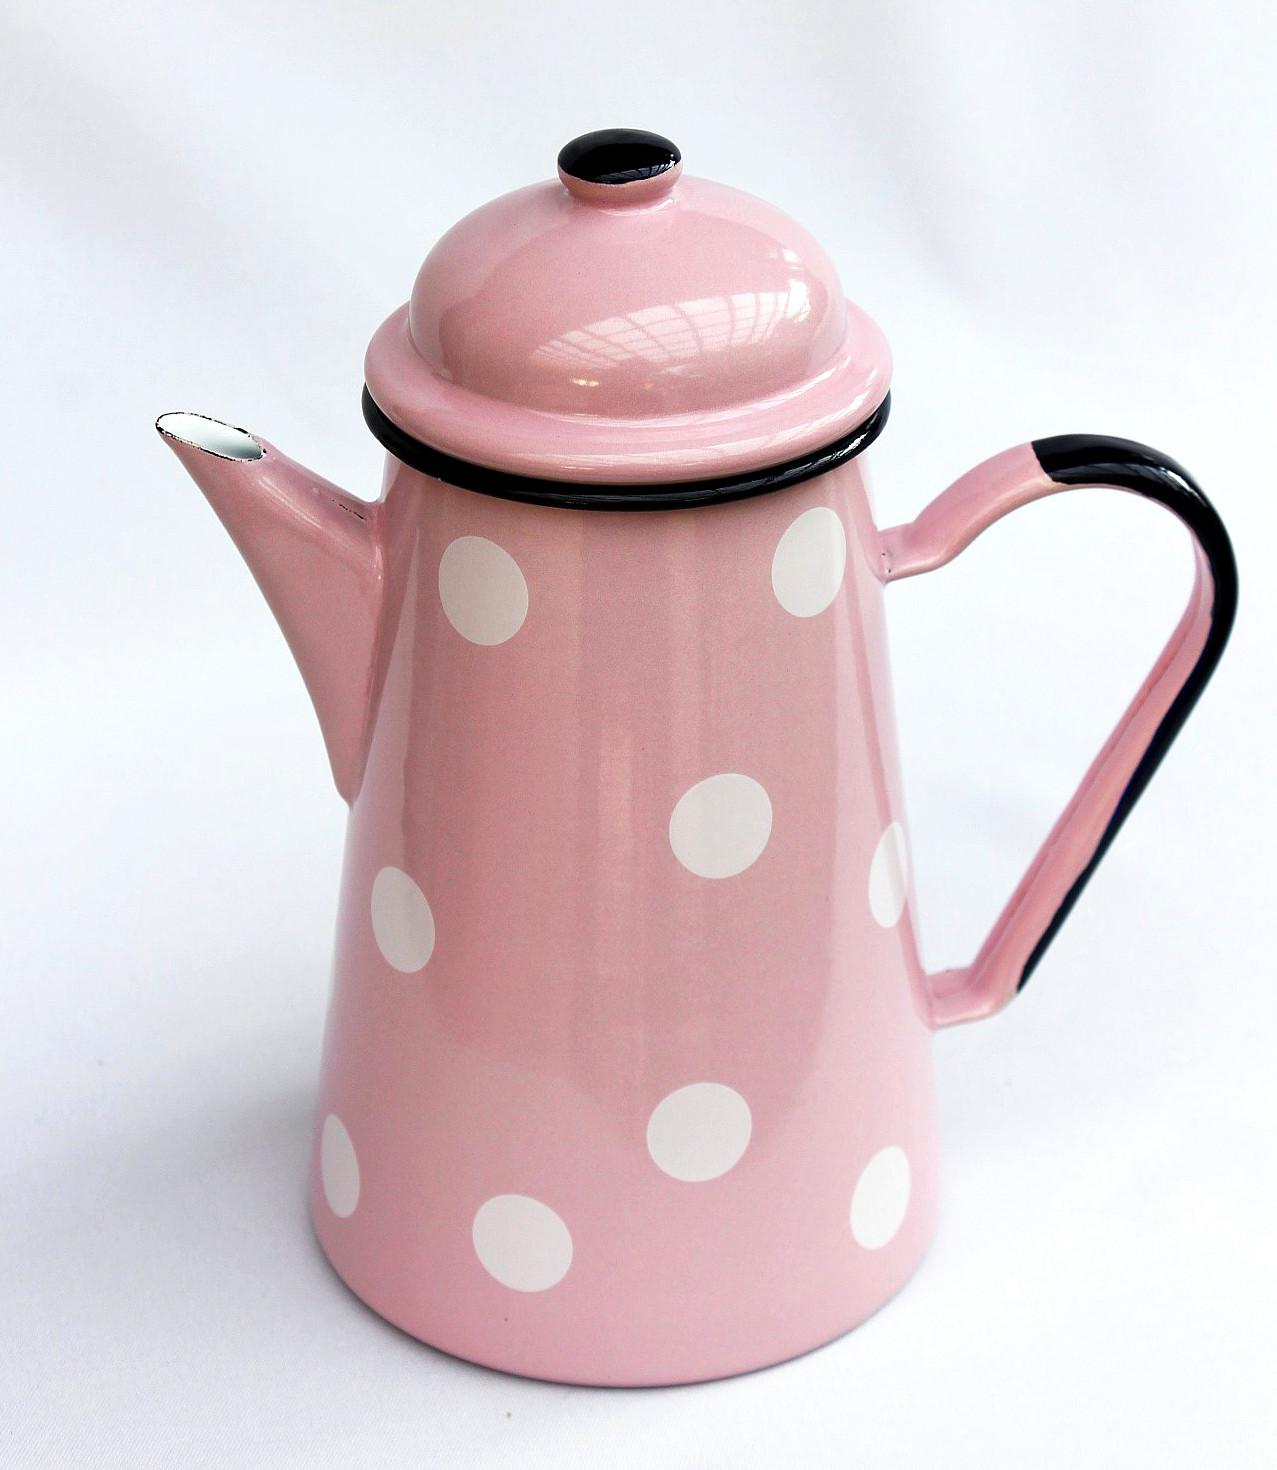 kaffeekanne 578tb rosa mit wei en punkten emailliert 22cm wasserkanne kanne emaille teekanne. Black Bedroom Furniture Sets. Home Design Ideas